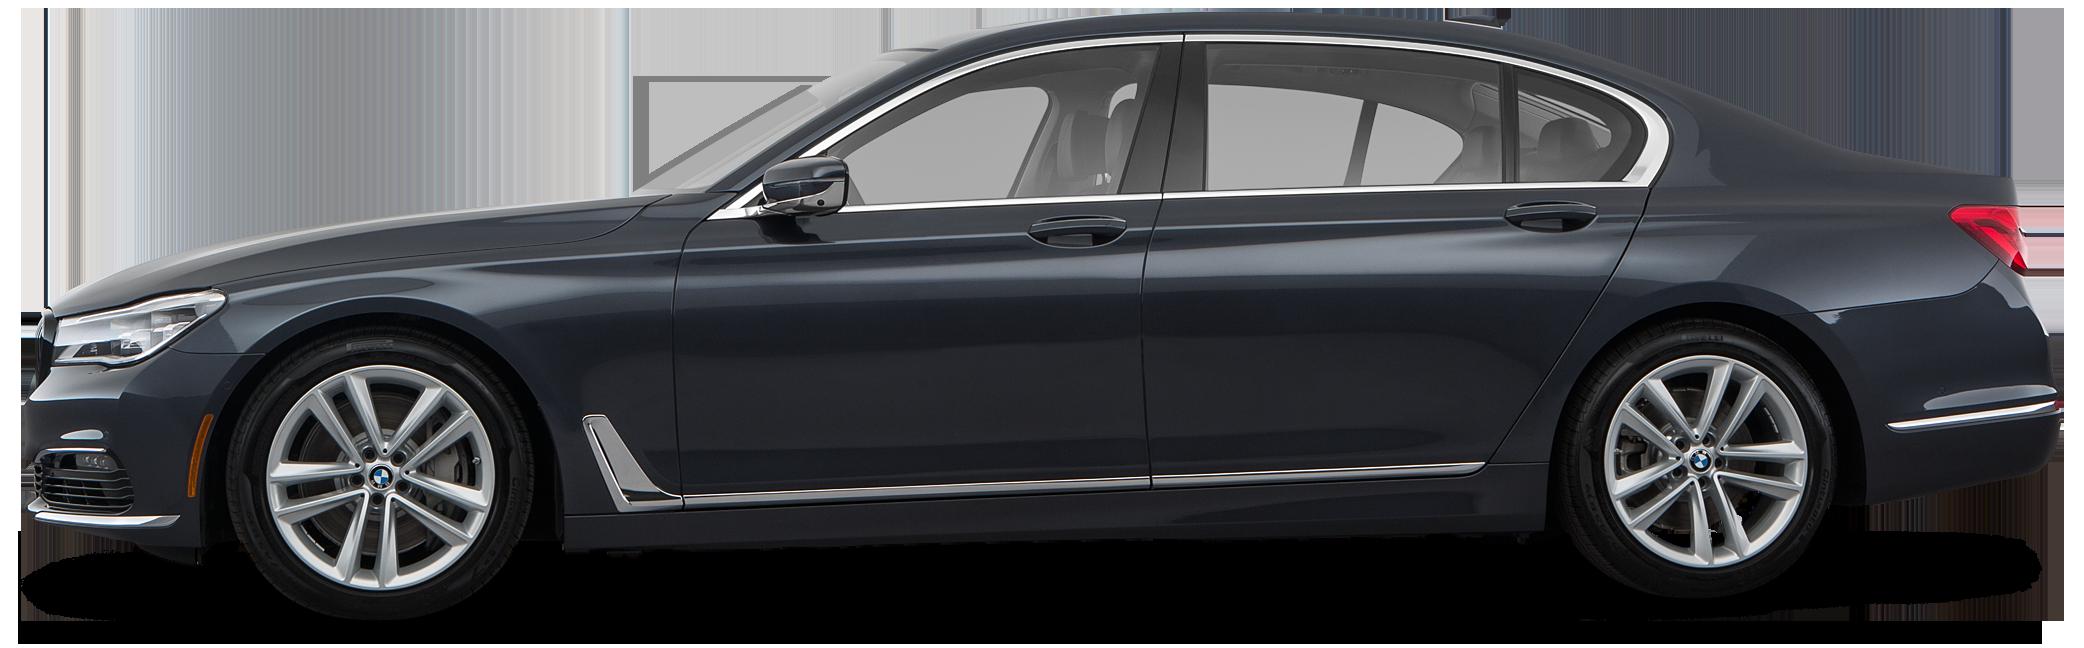 2019 BMW 750i Sedan xDrive